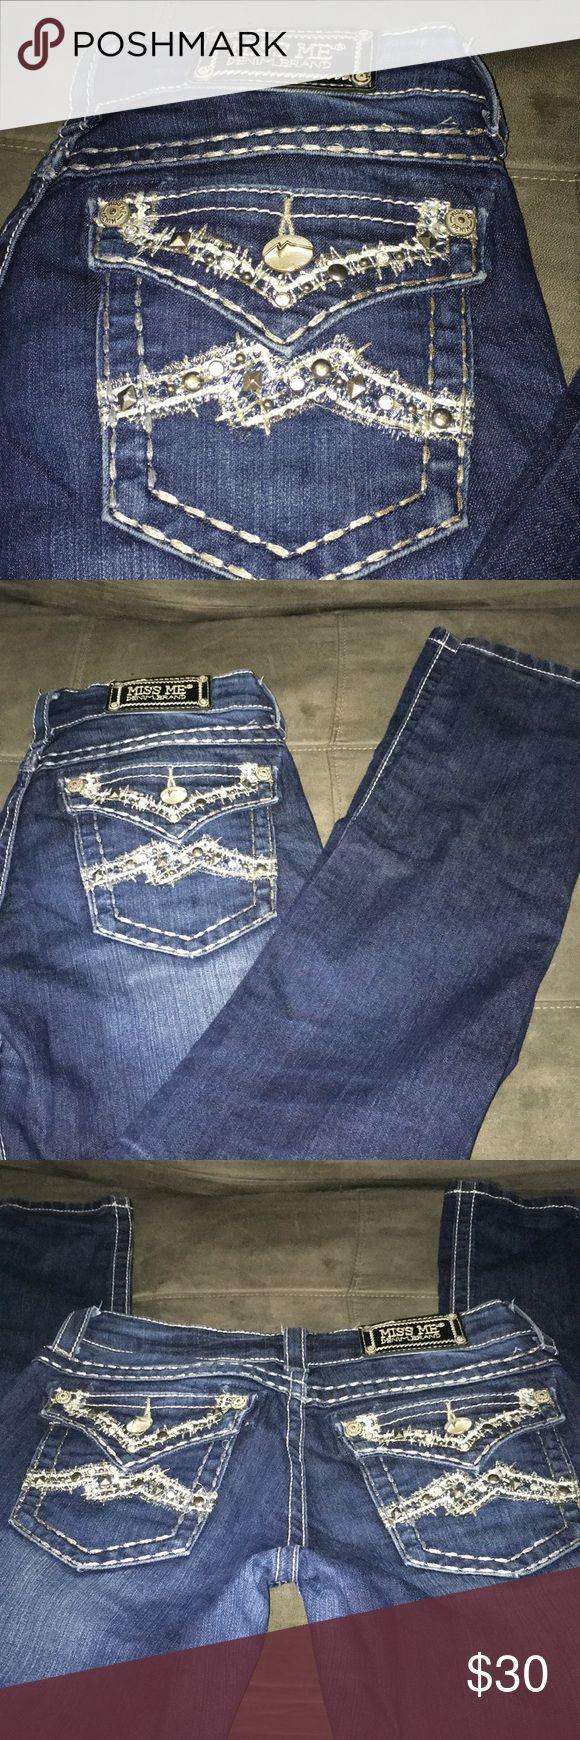 Miss me skinny jeans sz 28 Miss me skinny jeans sz 28 inseam is 31 Miss Me Jeans Skinny